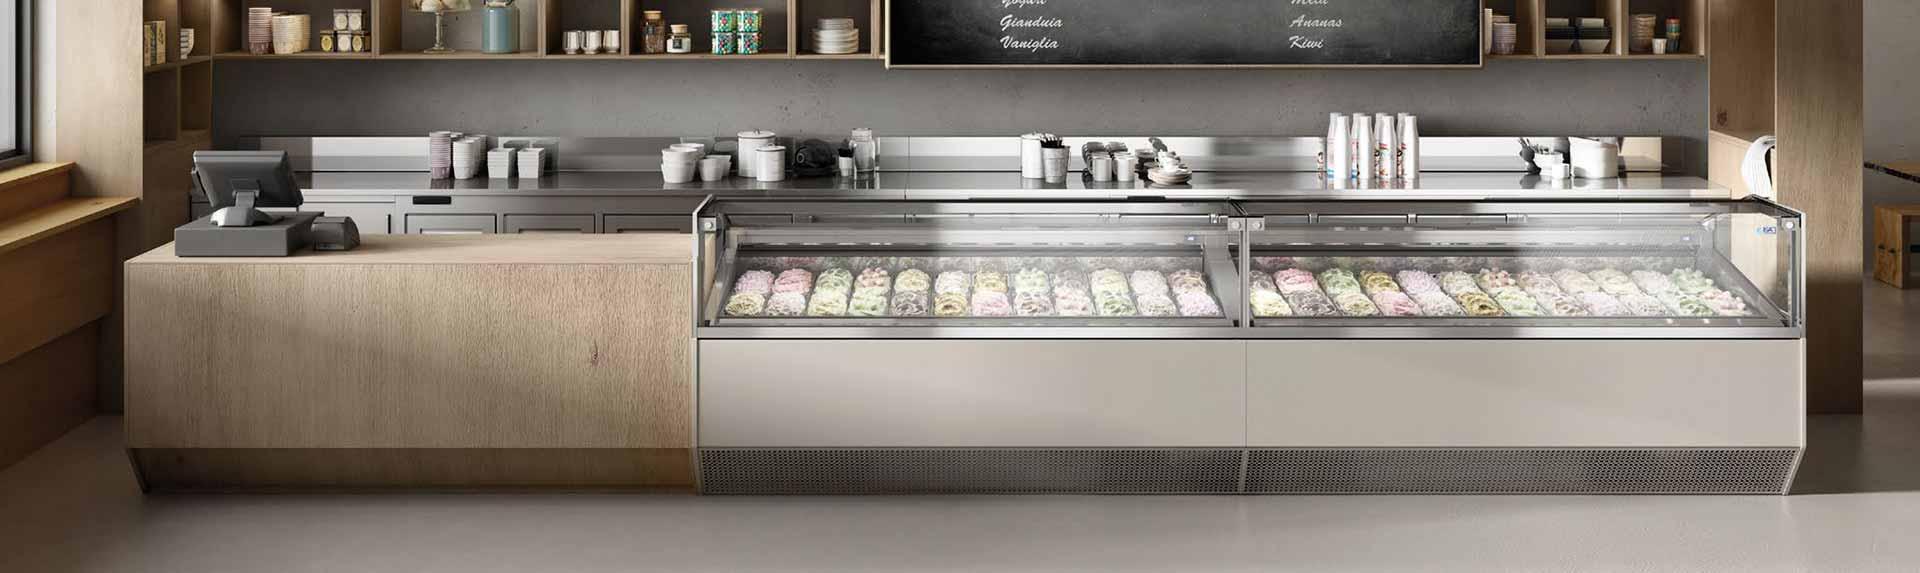 vitrina exhibidora de helados